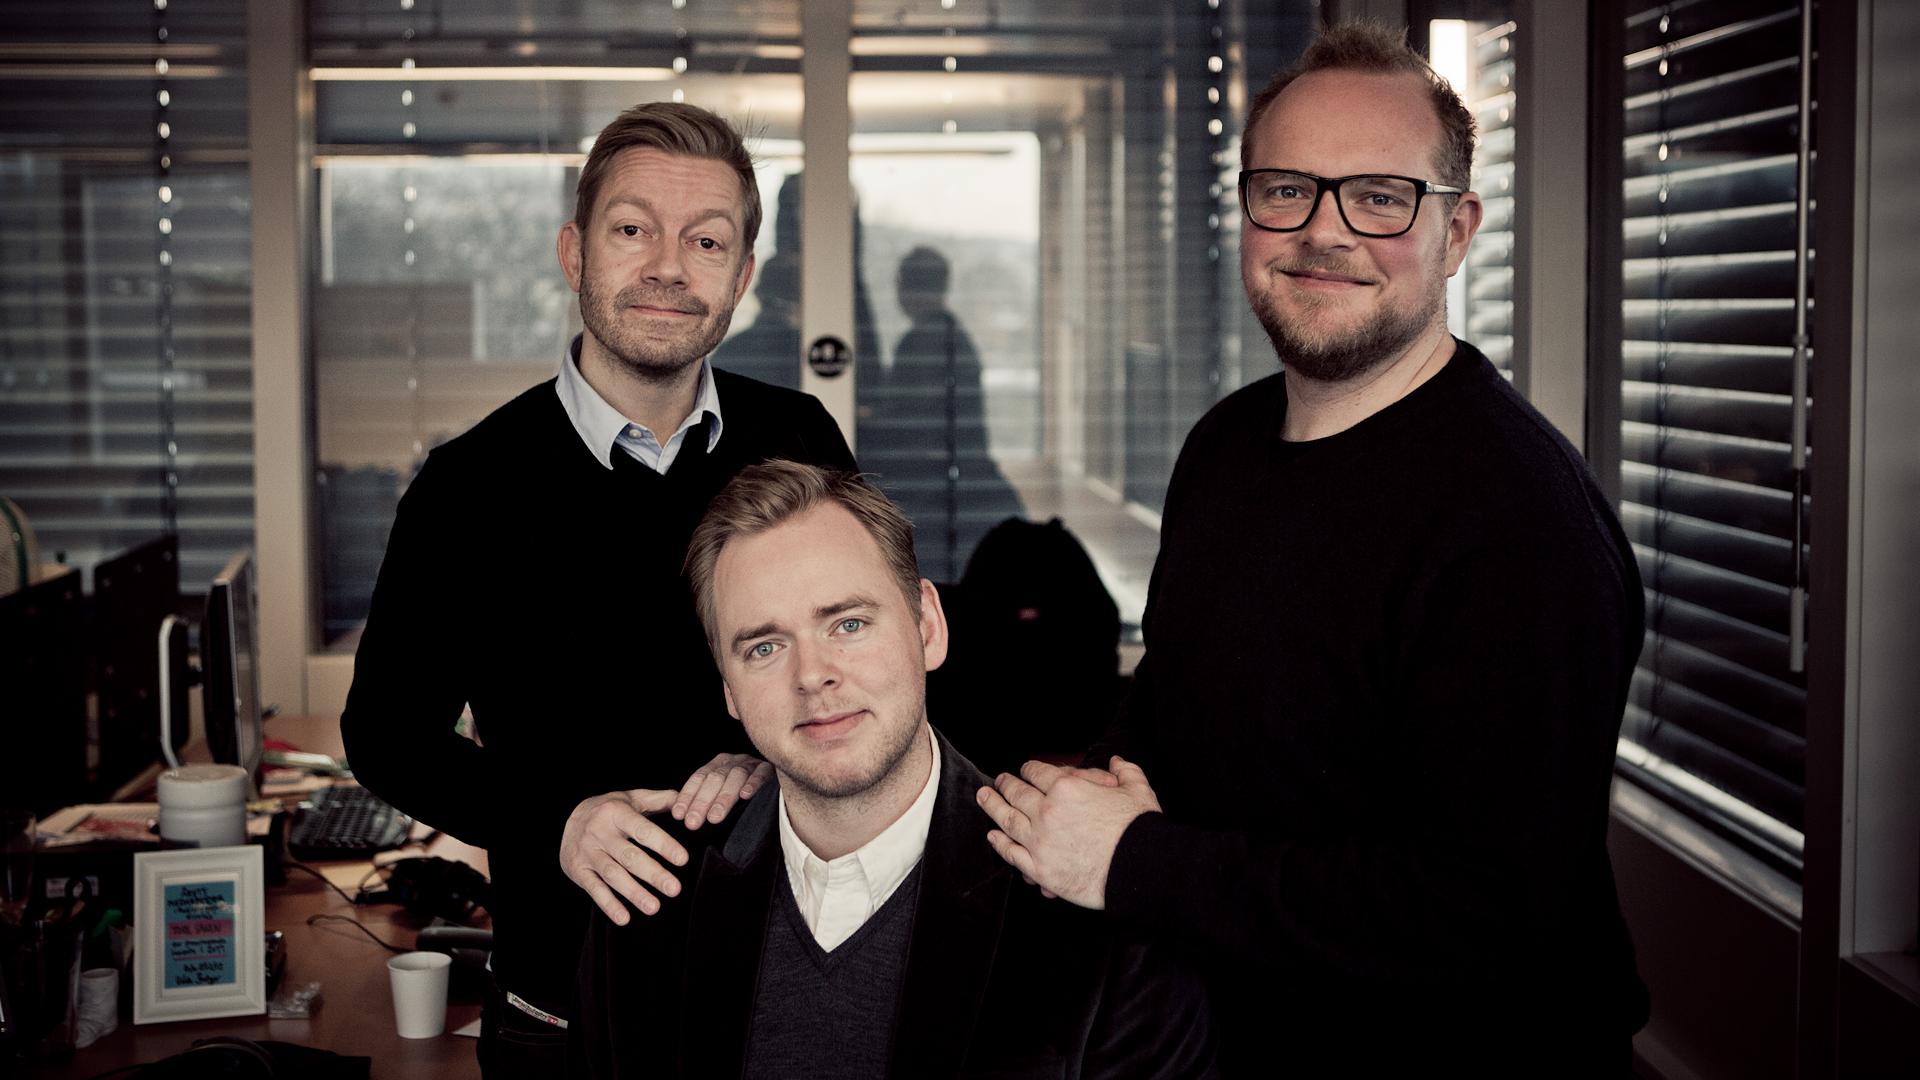 Bjarte Tjøstheim,Tore Sagen og Steinar Sagen i Radioresepsjonen på P3 (Foto: Kristoffer Pettersen Rambøl, NRK P3).